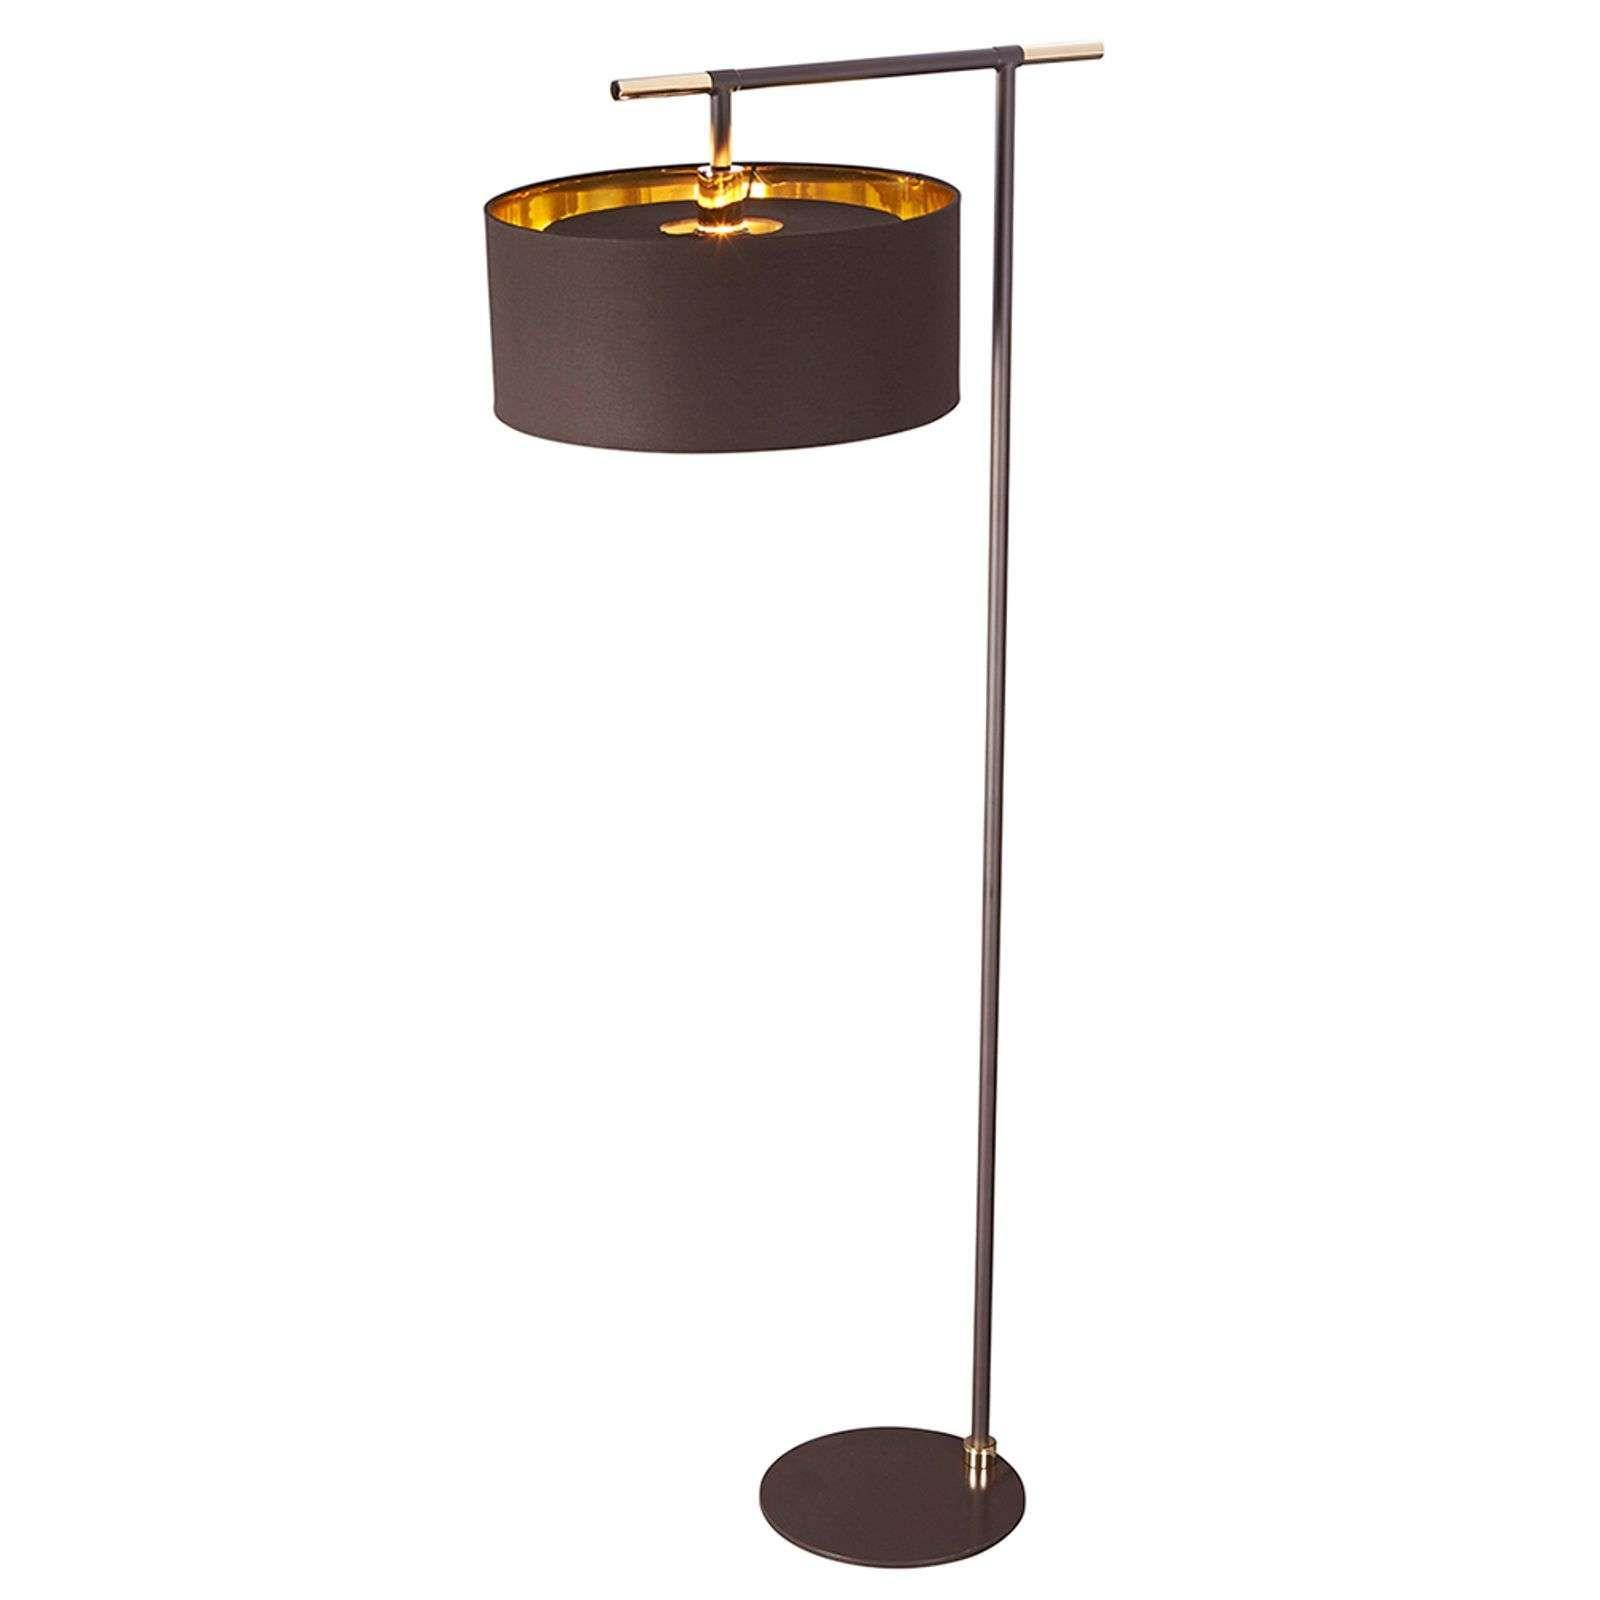 Mooie Stoffen Vloerlamp Balance Tripod Lamp Lampen En